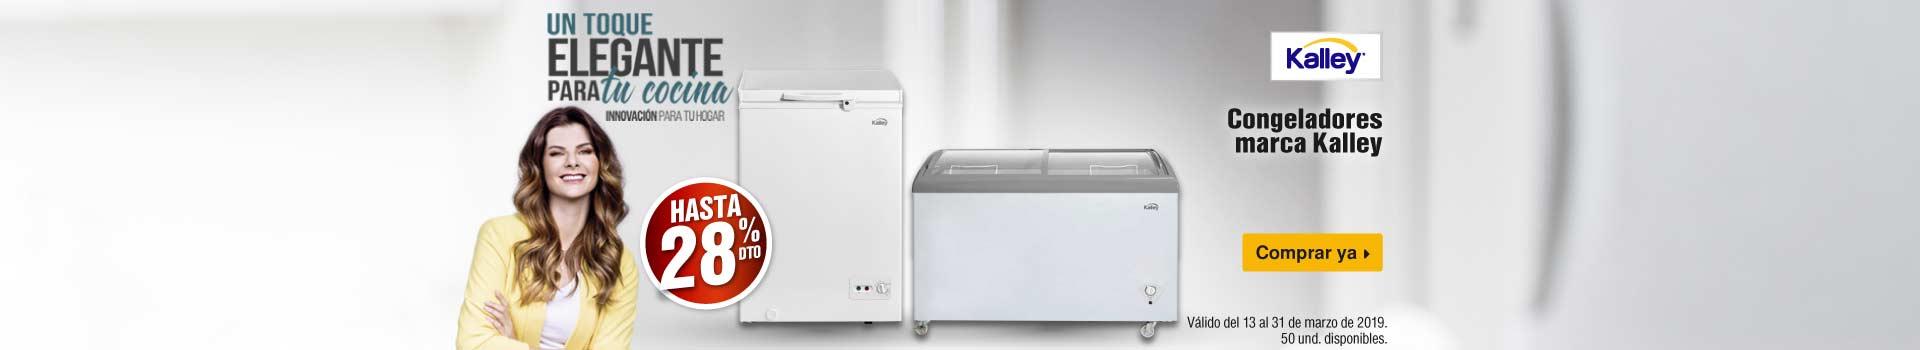 AK-KT-mayores-1-ELECT-BCAT-refrigeracion-kalley-130319